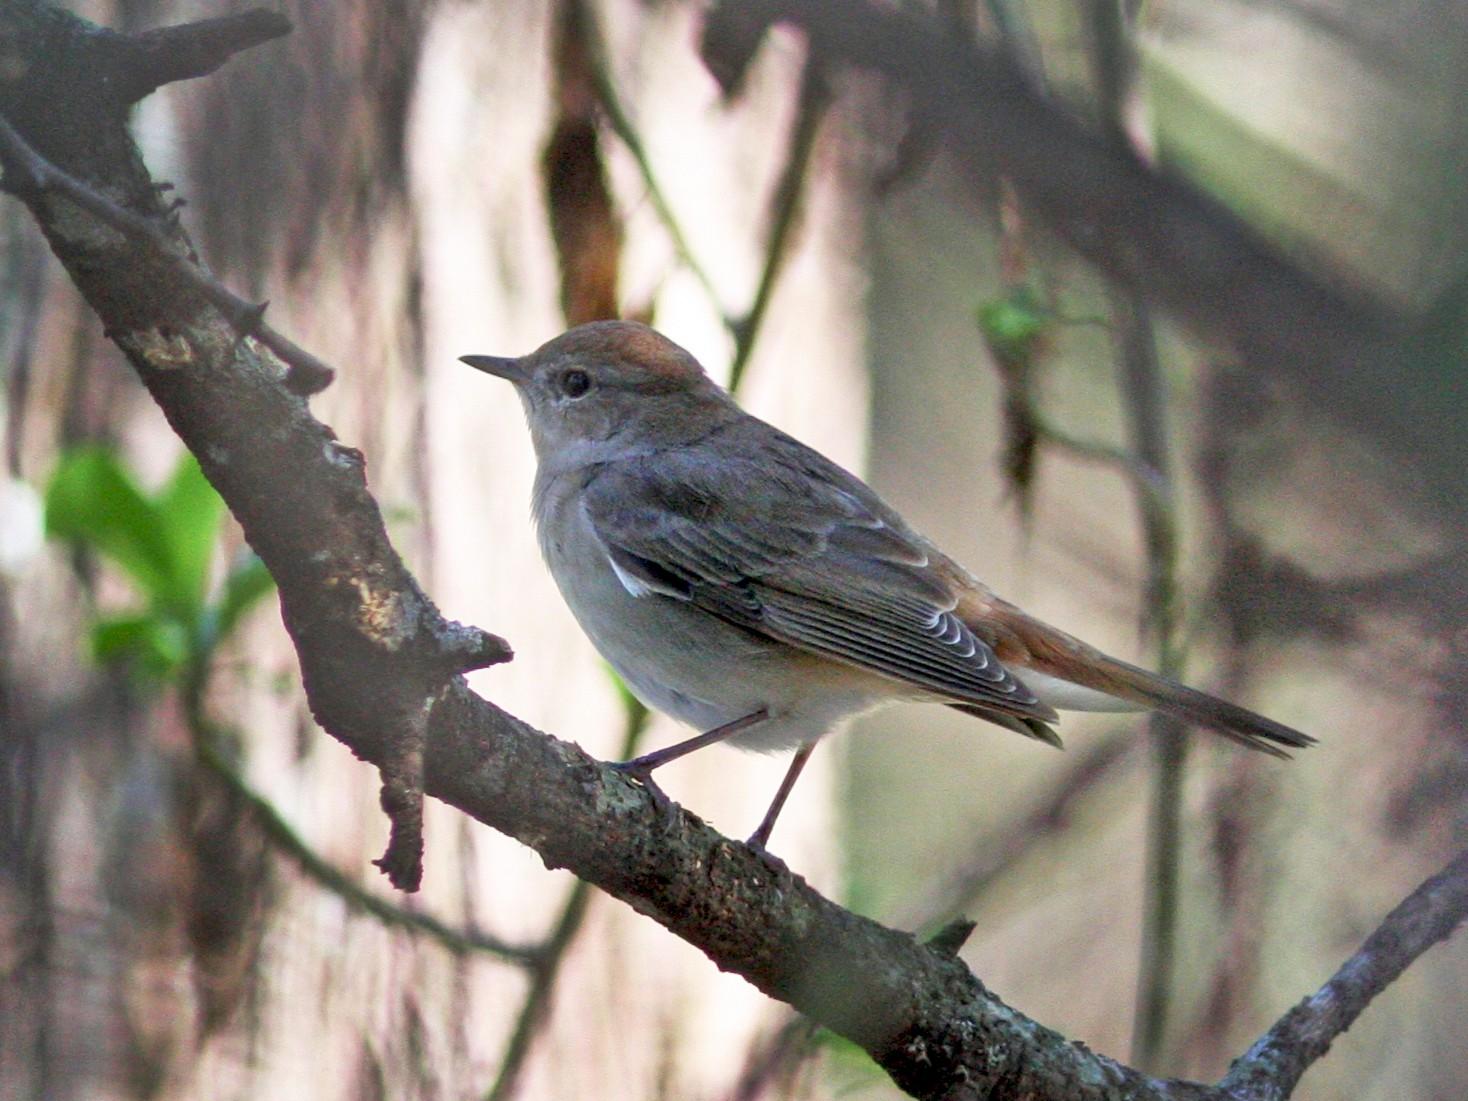 Common Nightingale - Daniel Jauvin